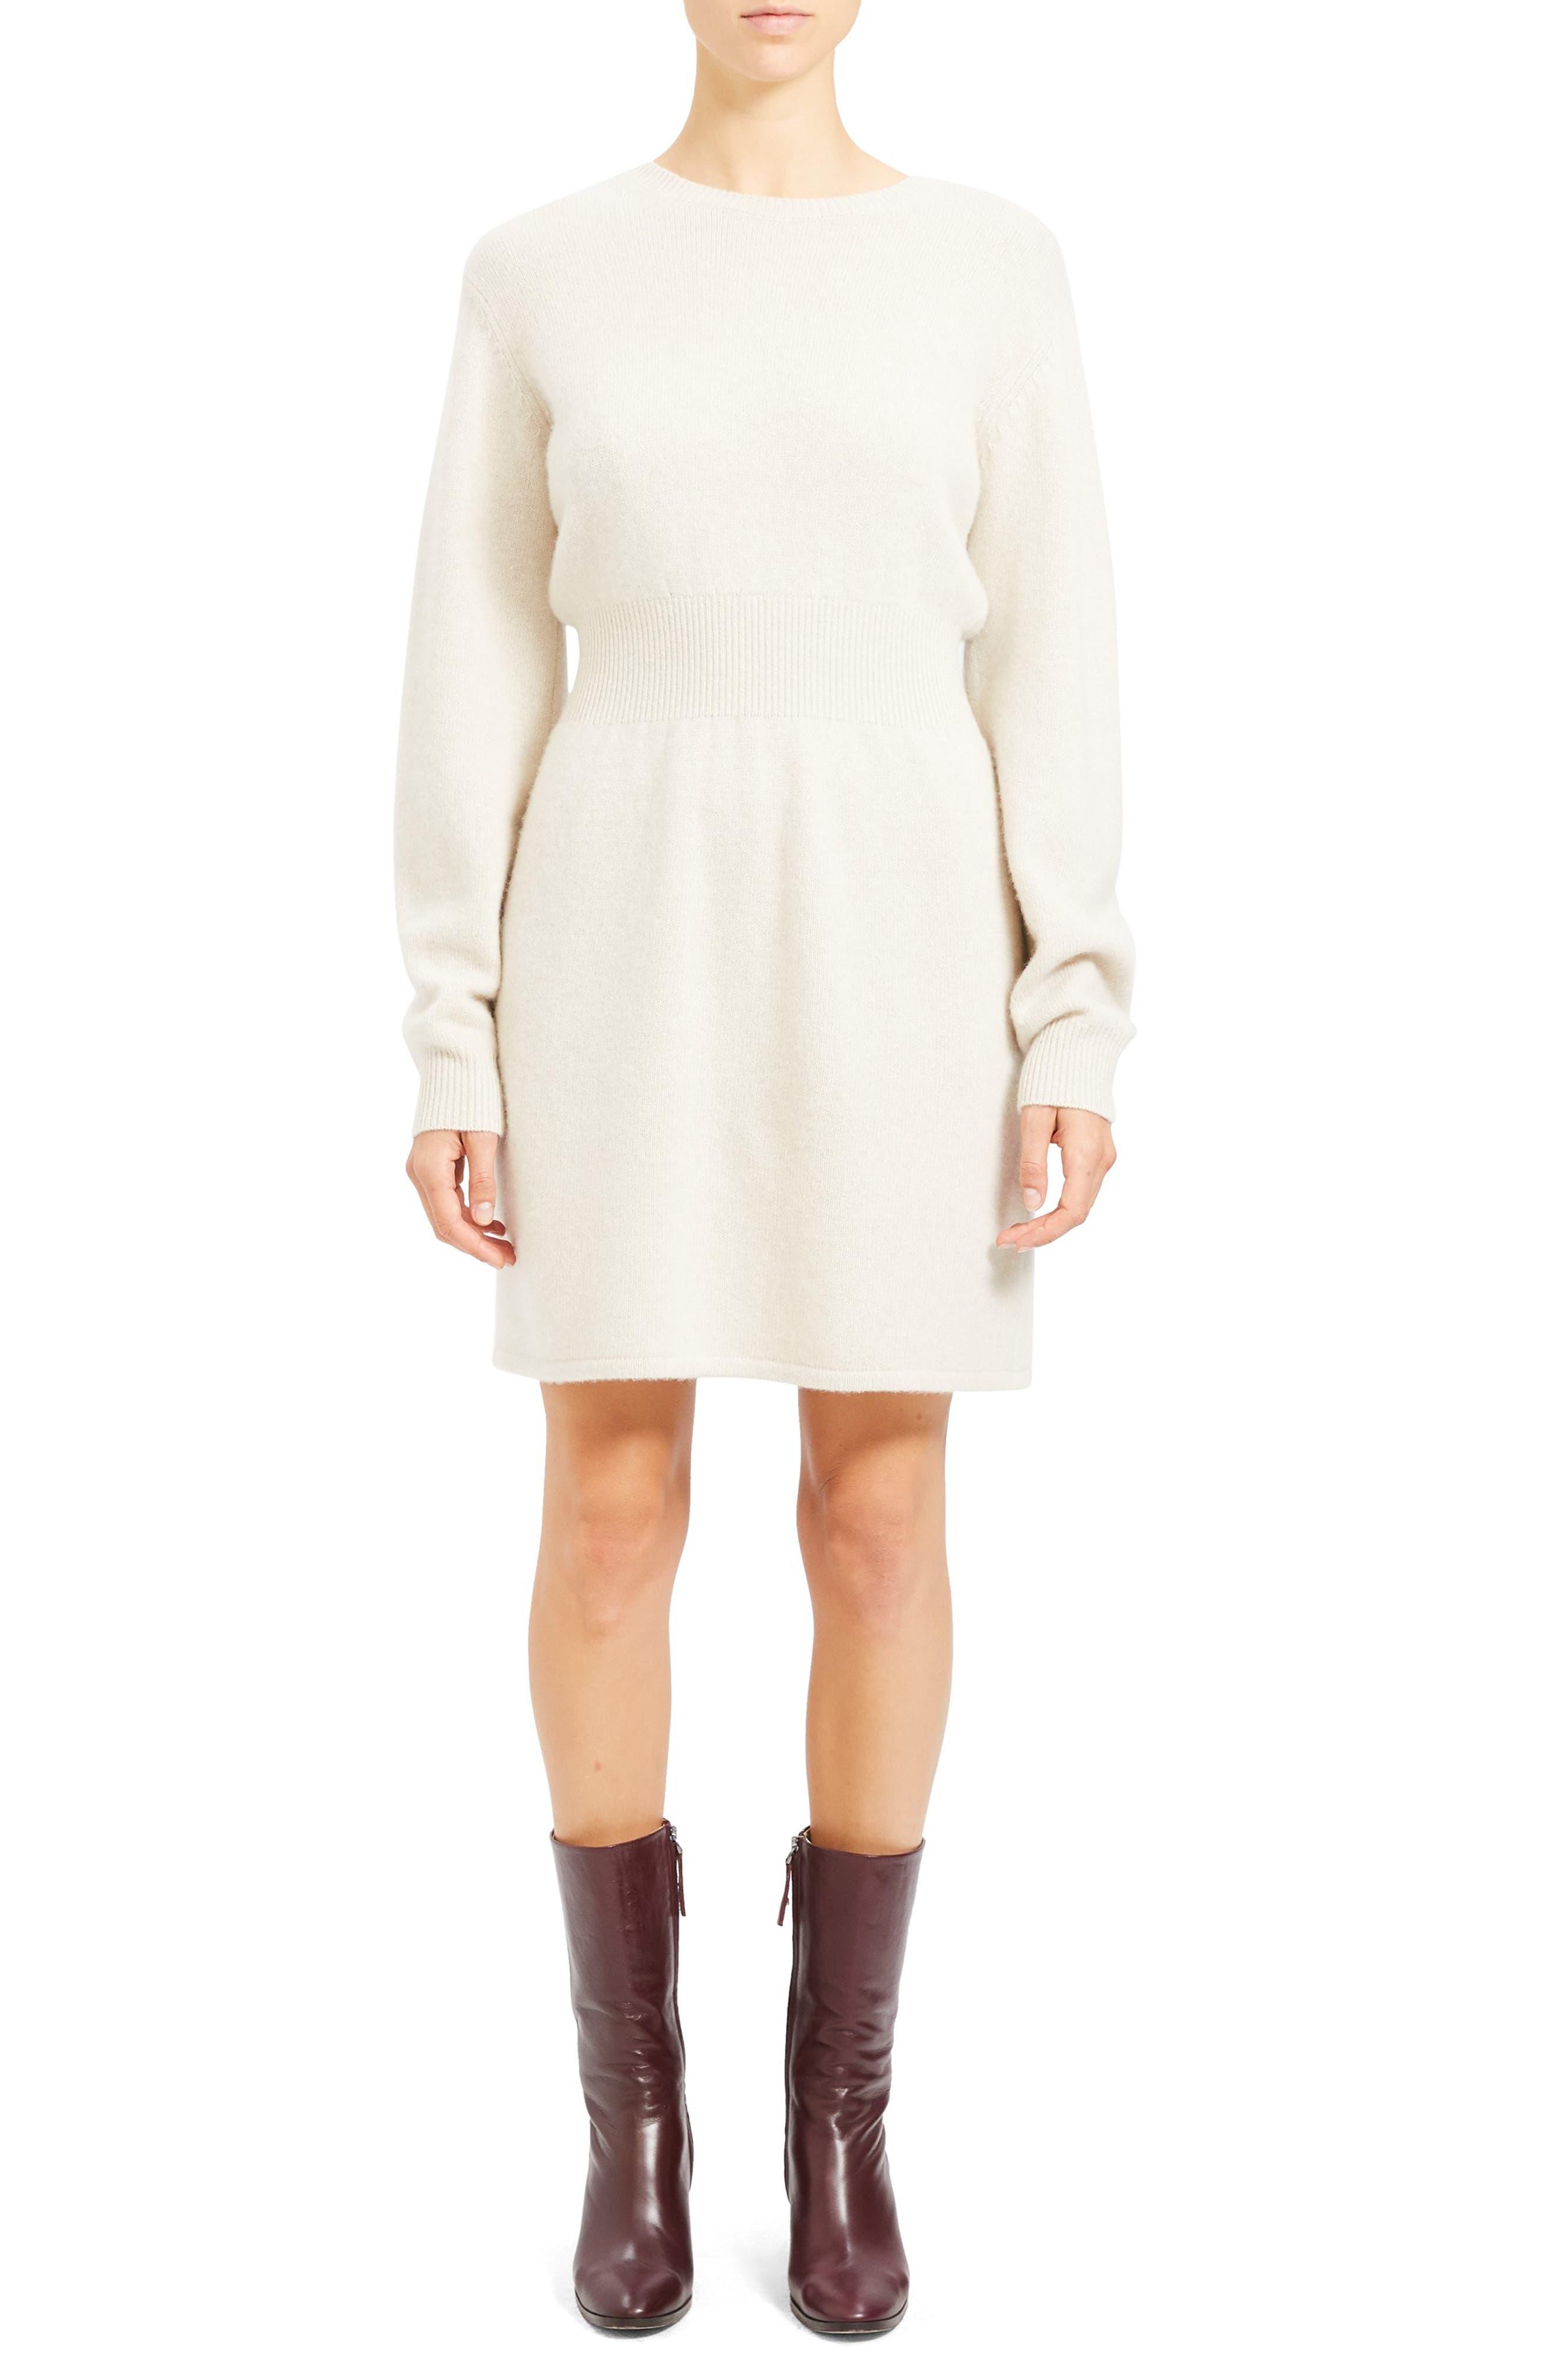 Theory Dresses Wool & Cashmere Long Sleeve Sweater Dress